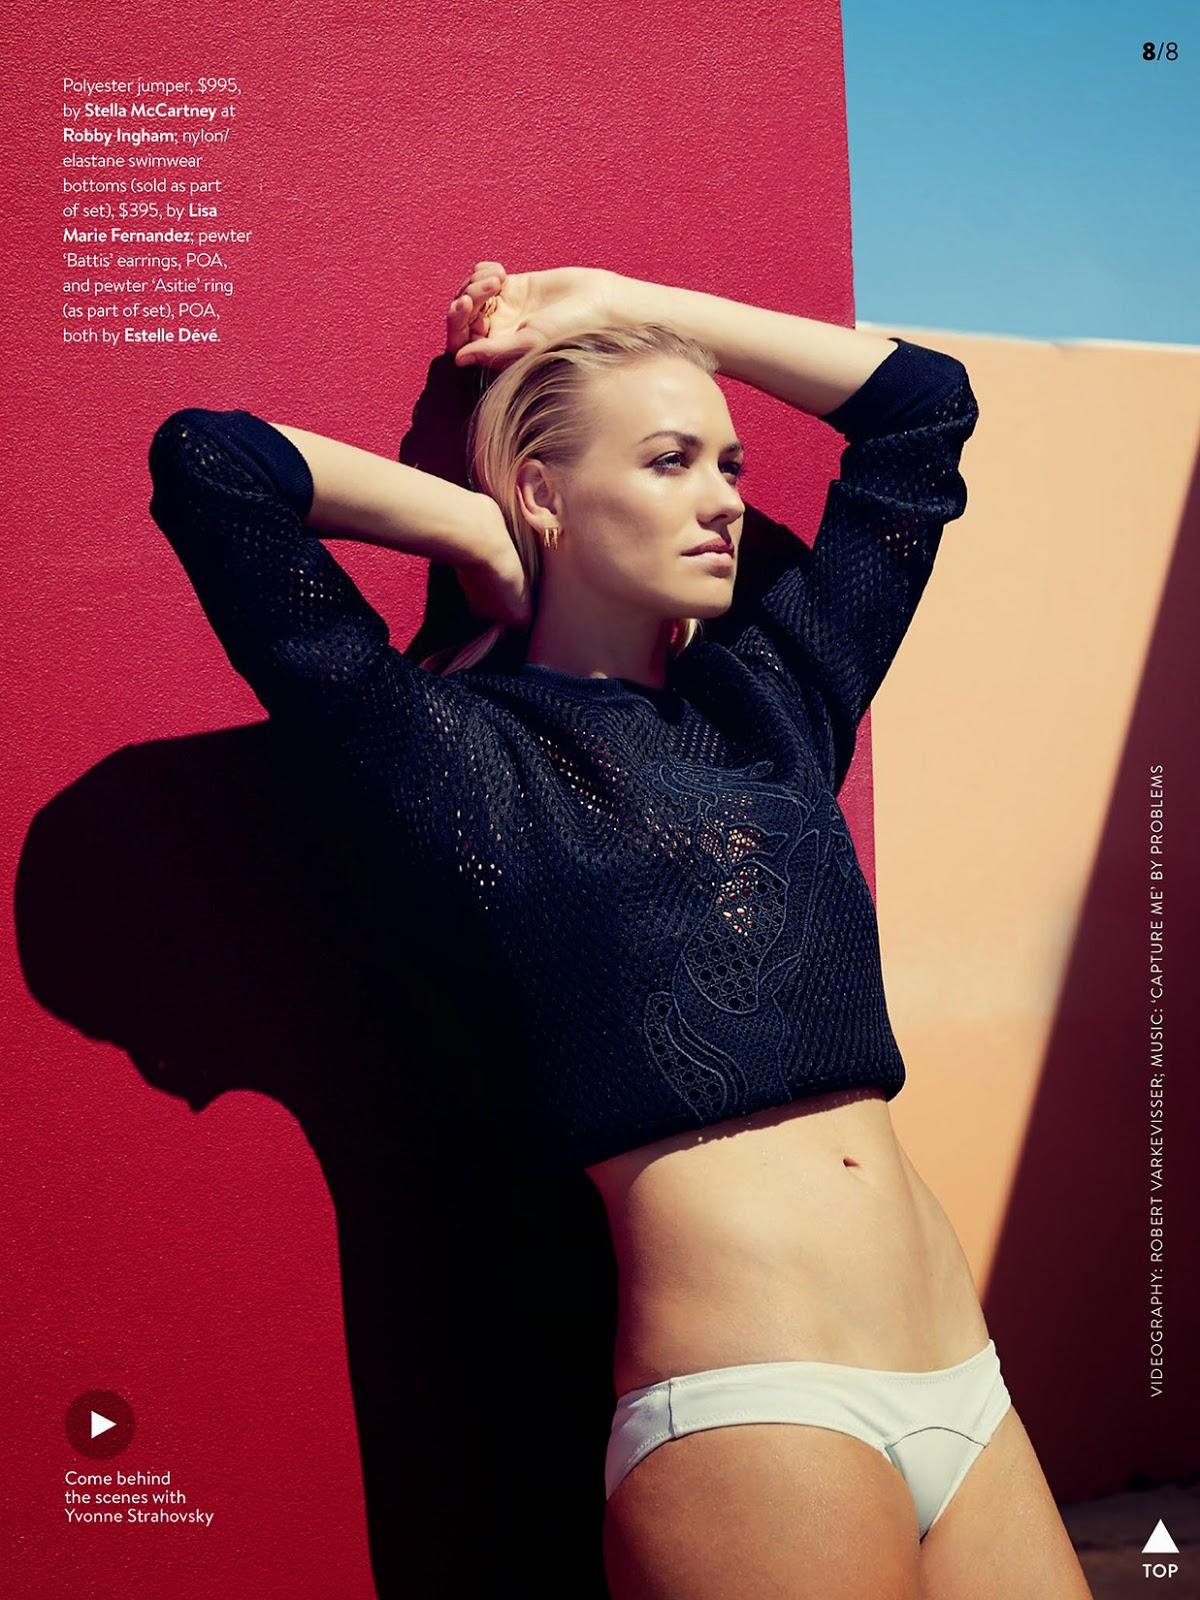 Hd Dexter Wallpaper Fashion Dexter Alum Yvonne Strahovski Poses For Gq